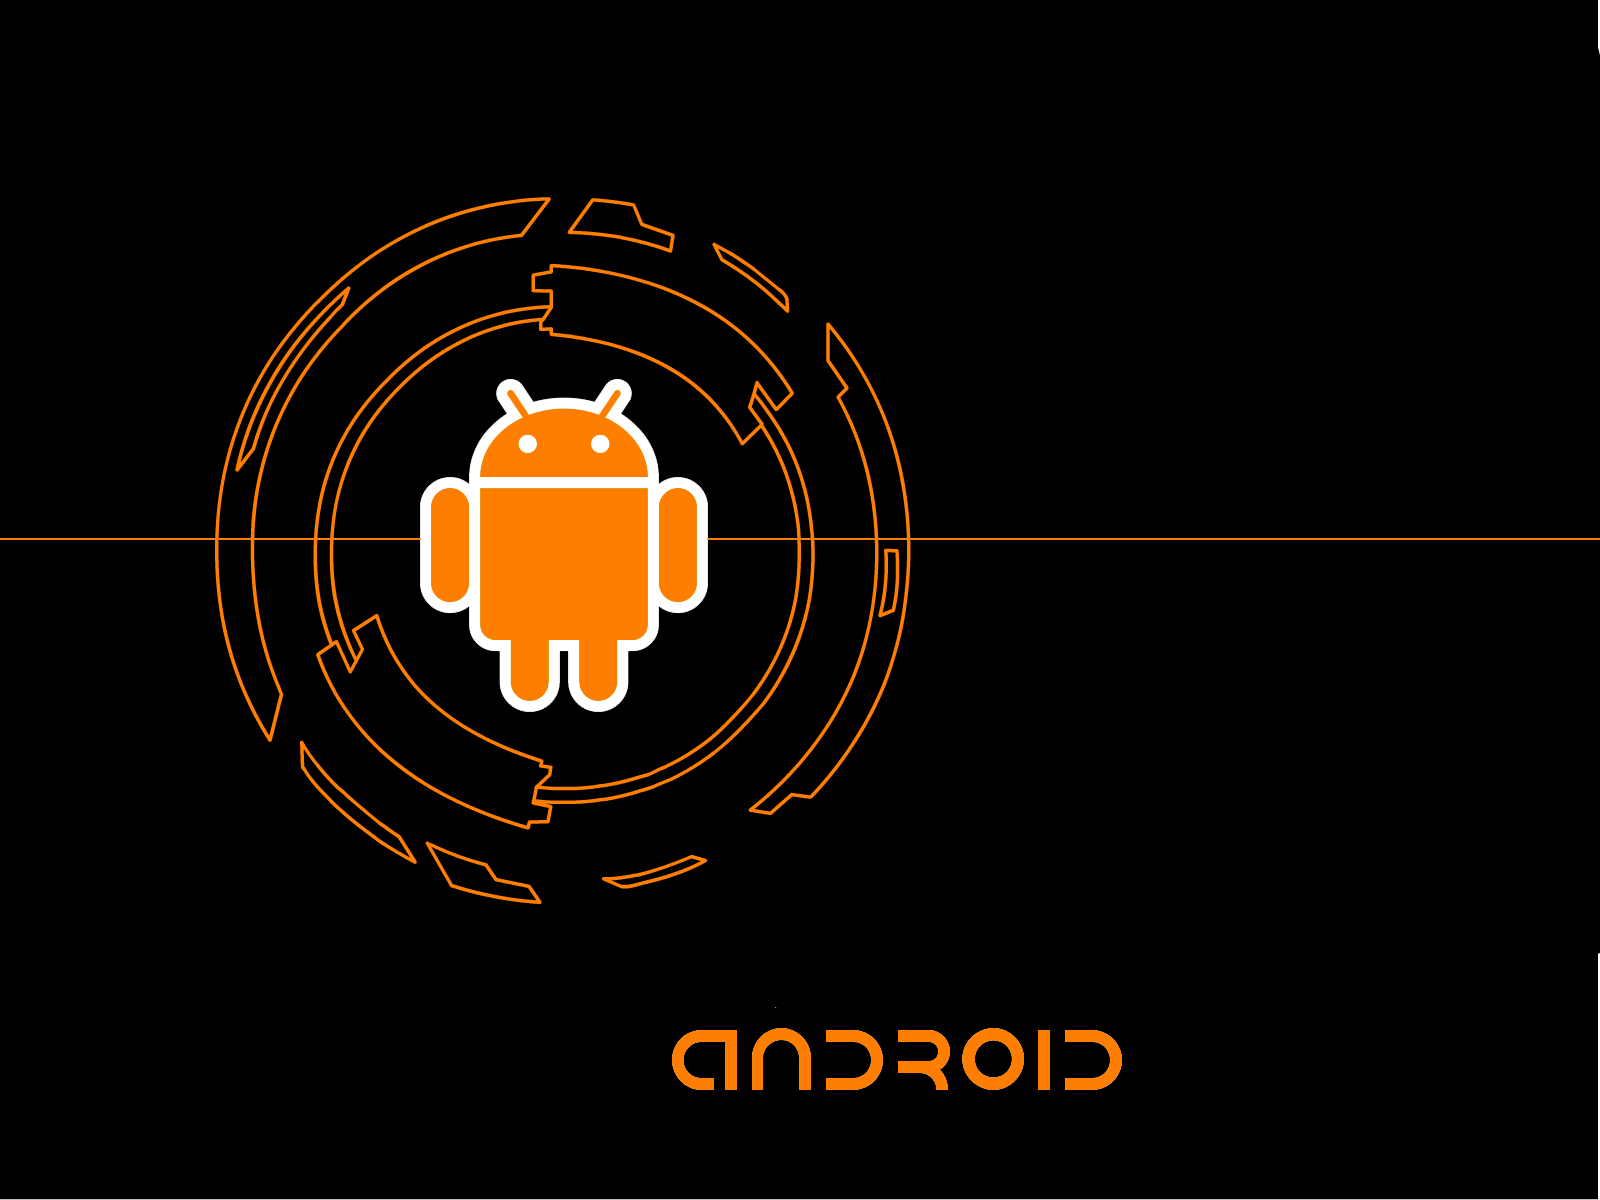 Android desktop wallpaper wallpapersafari android wallpapers free download android wallpapers for pc desktop voltagebd Choice Image